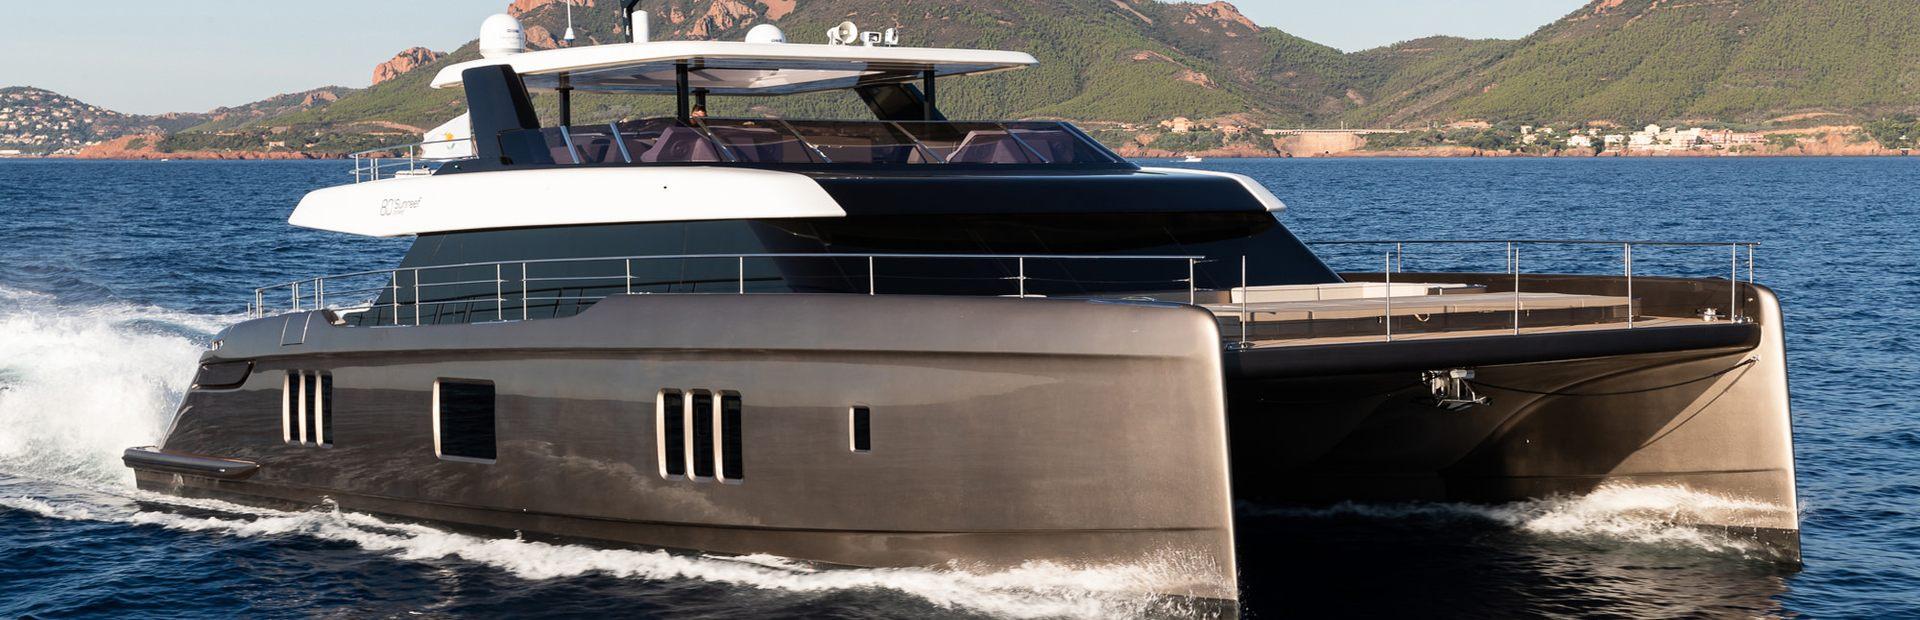 80 Sunreef Power Yacht Charter